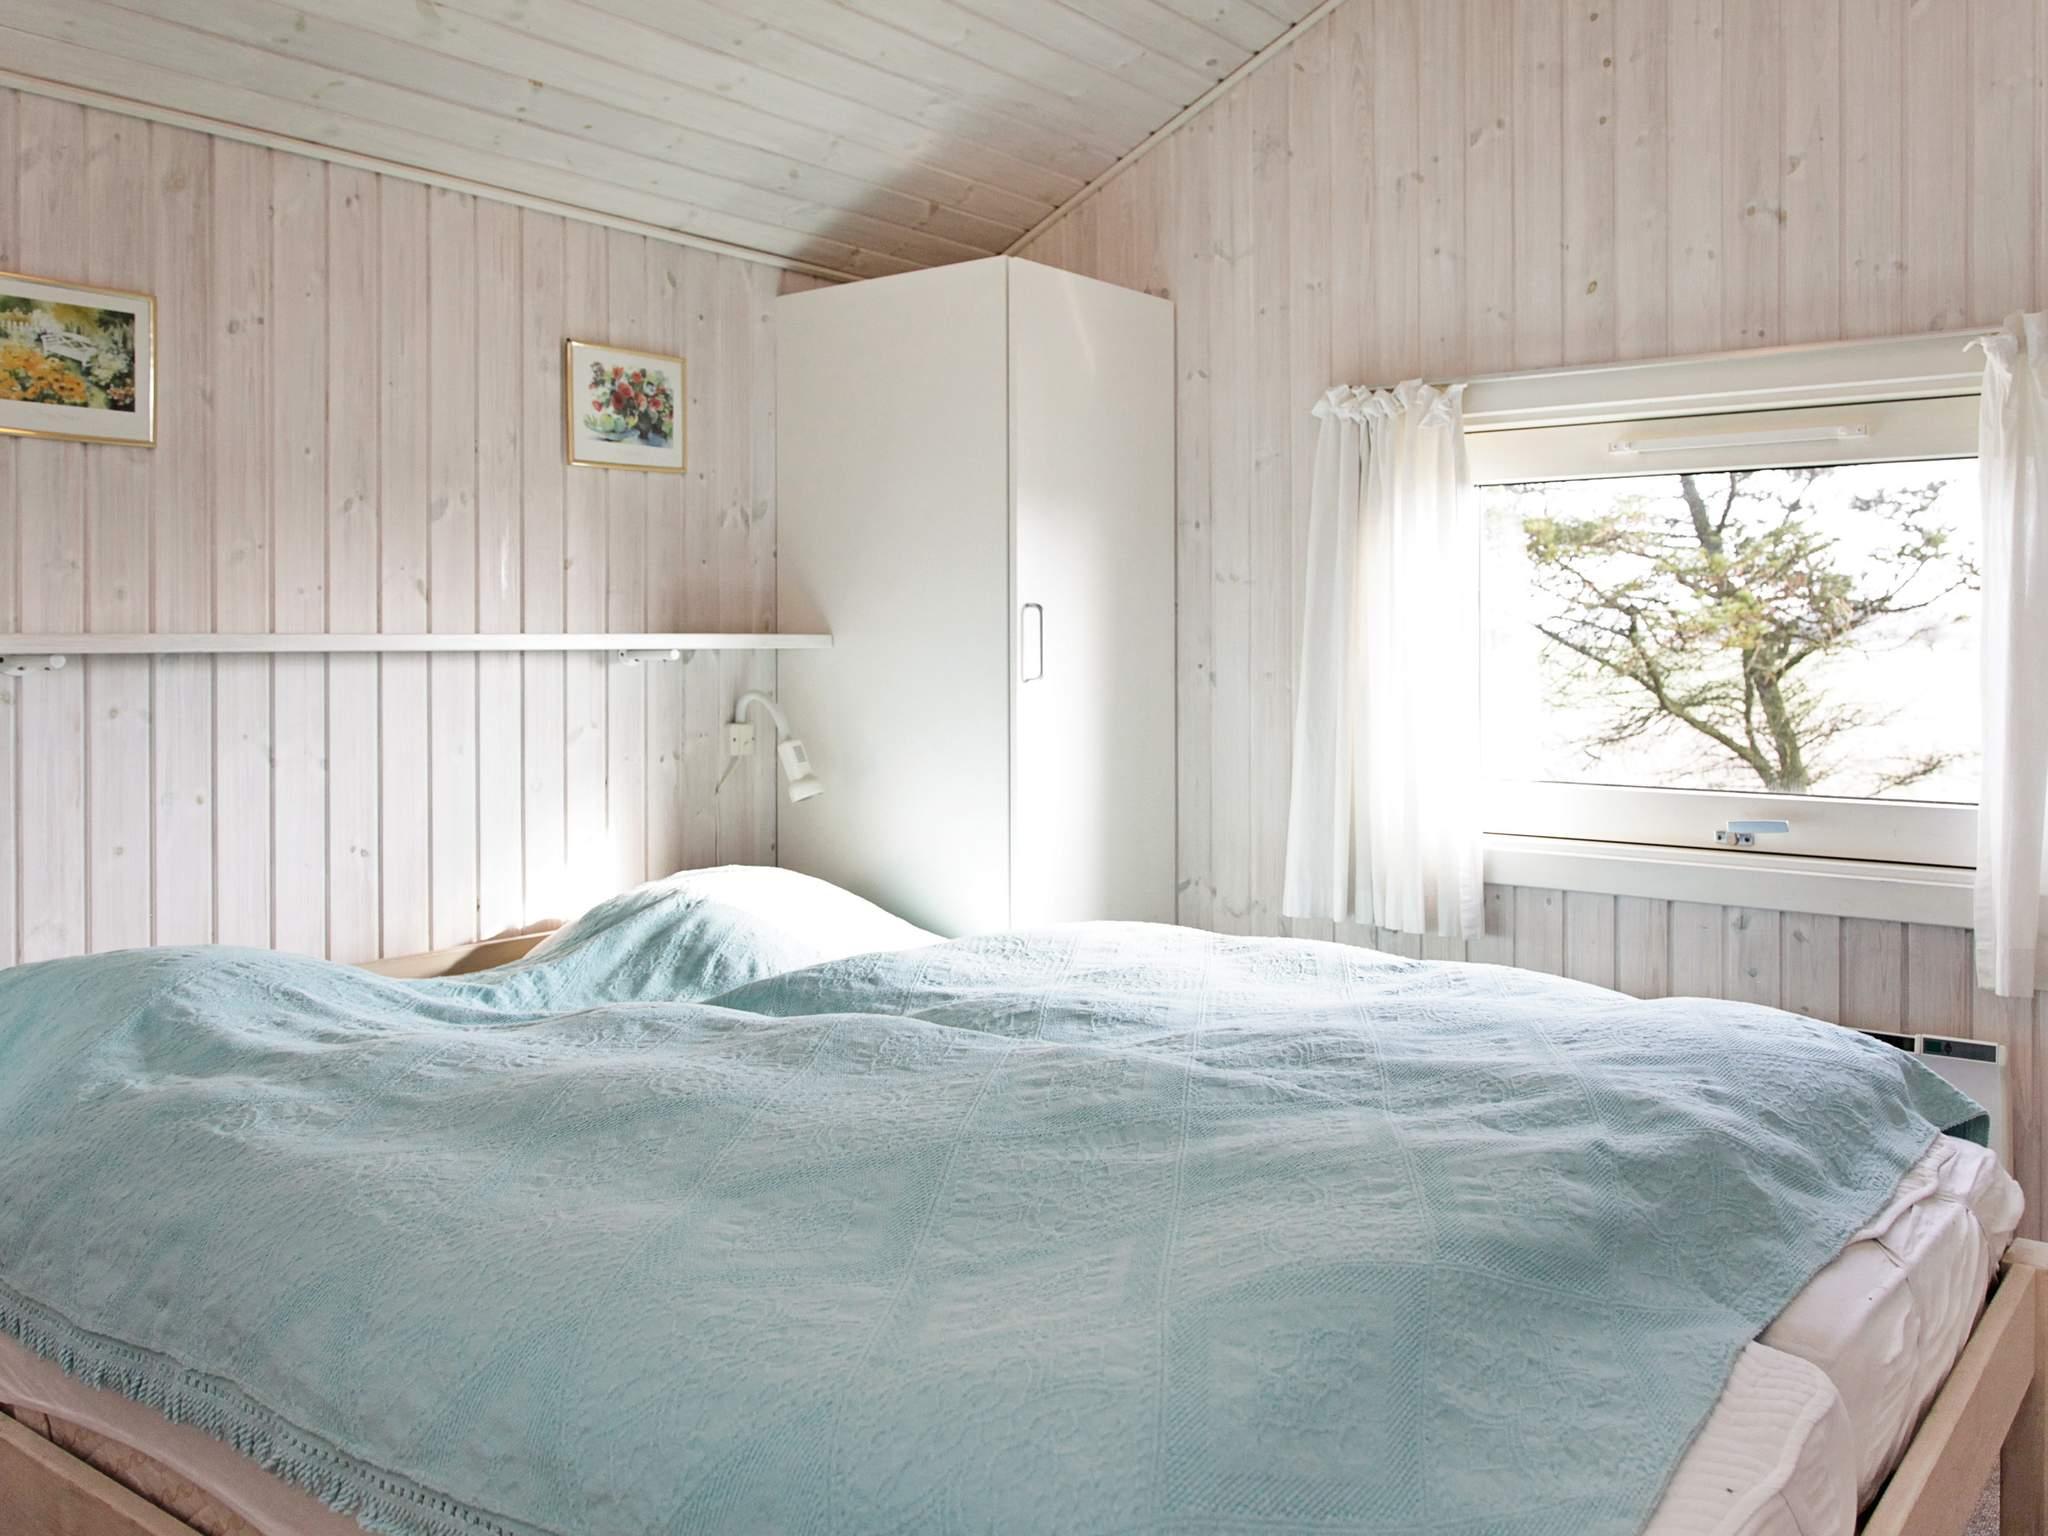 Ferienhaus Vesteregn (82671), Humble, , Langeland, Dänemark, Bild 12